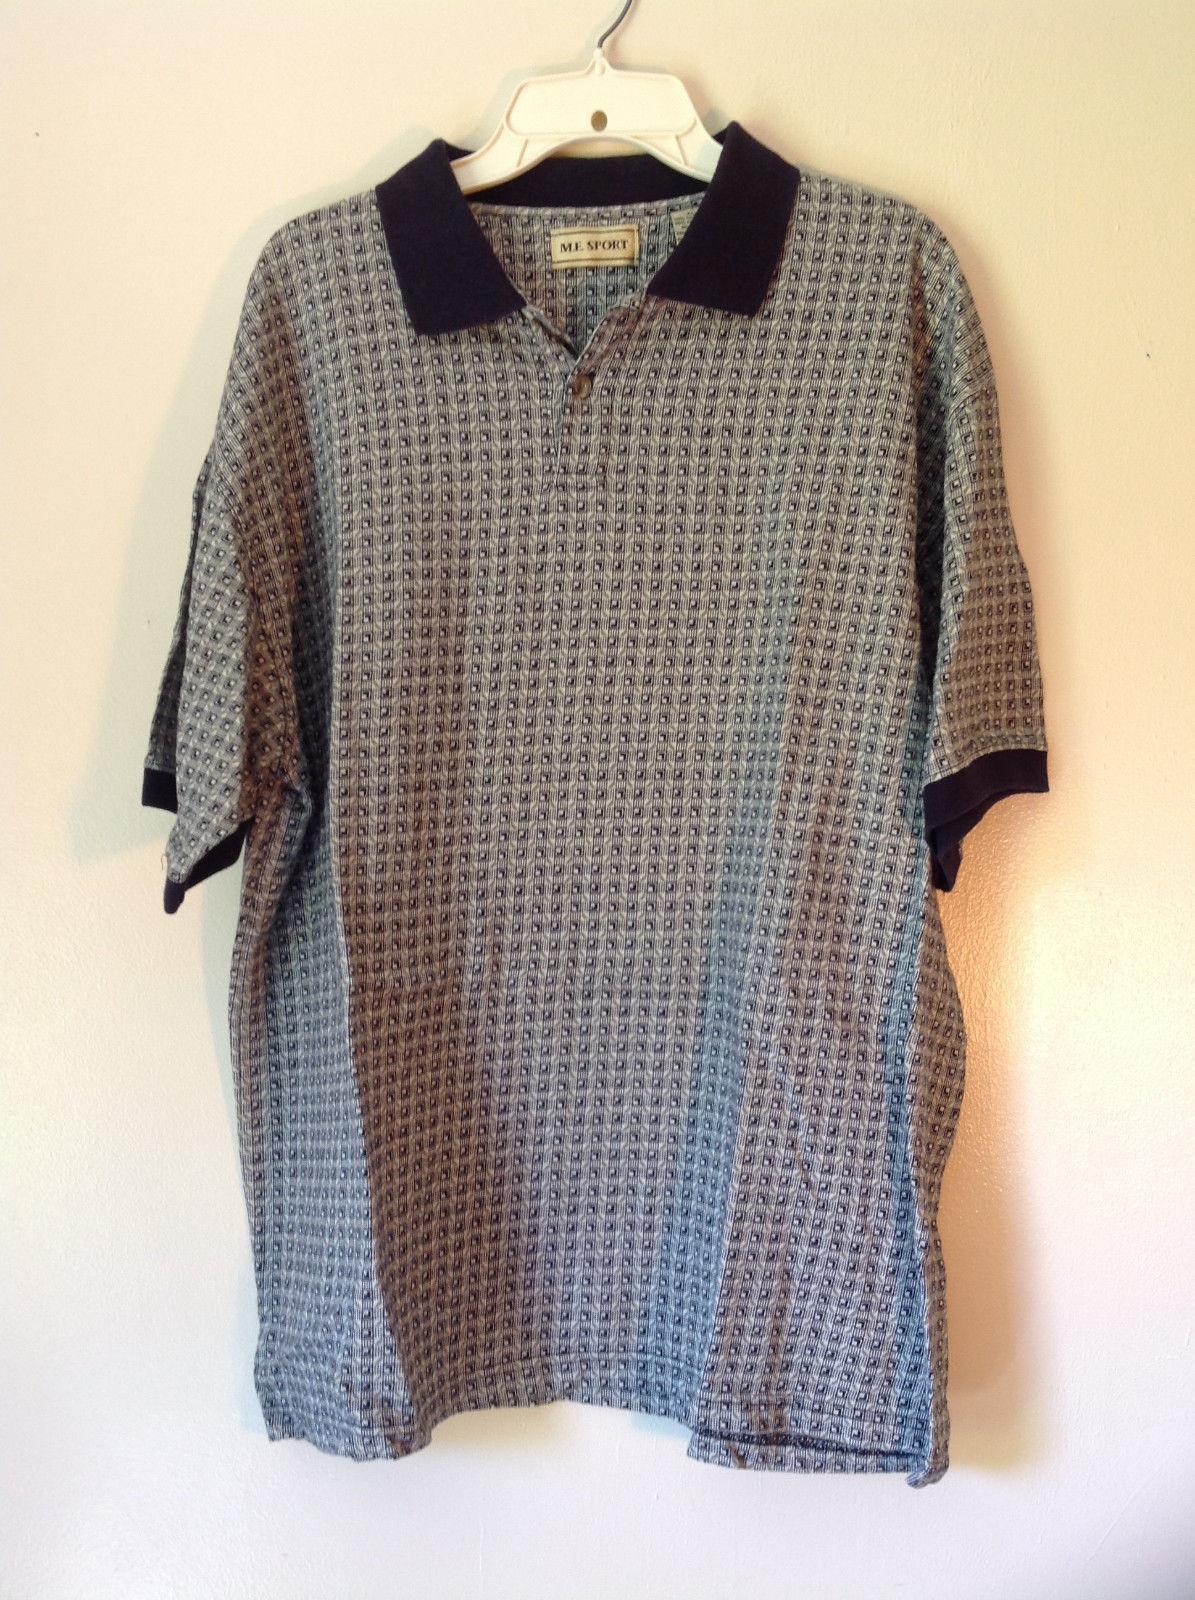 M E Sport Size XL Short Sleeve Polo Shirt Black and White Pattern Black Collar